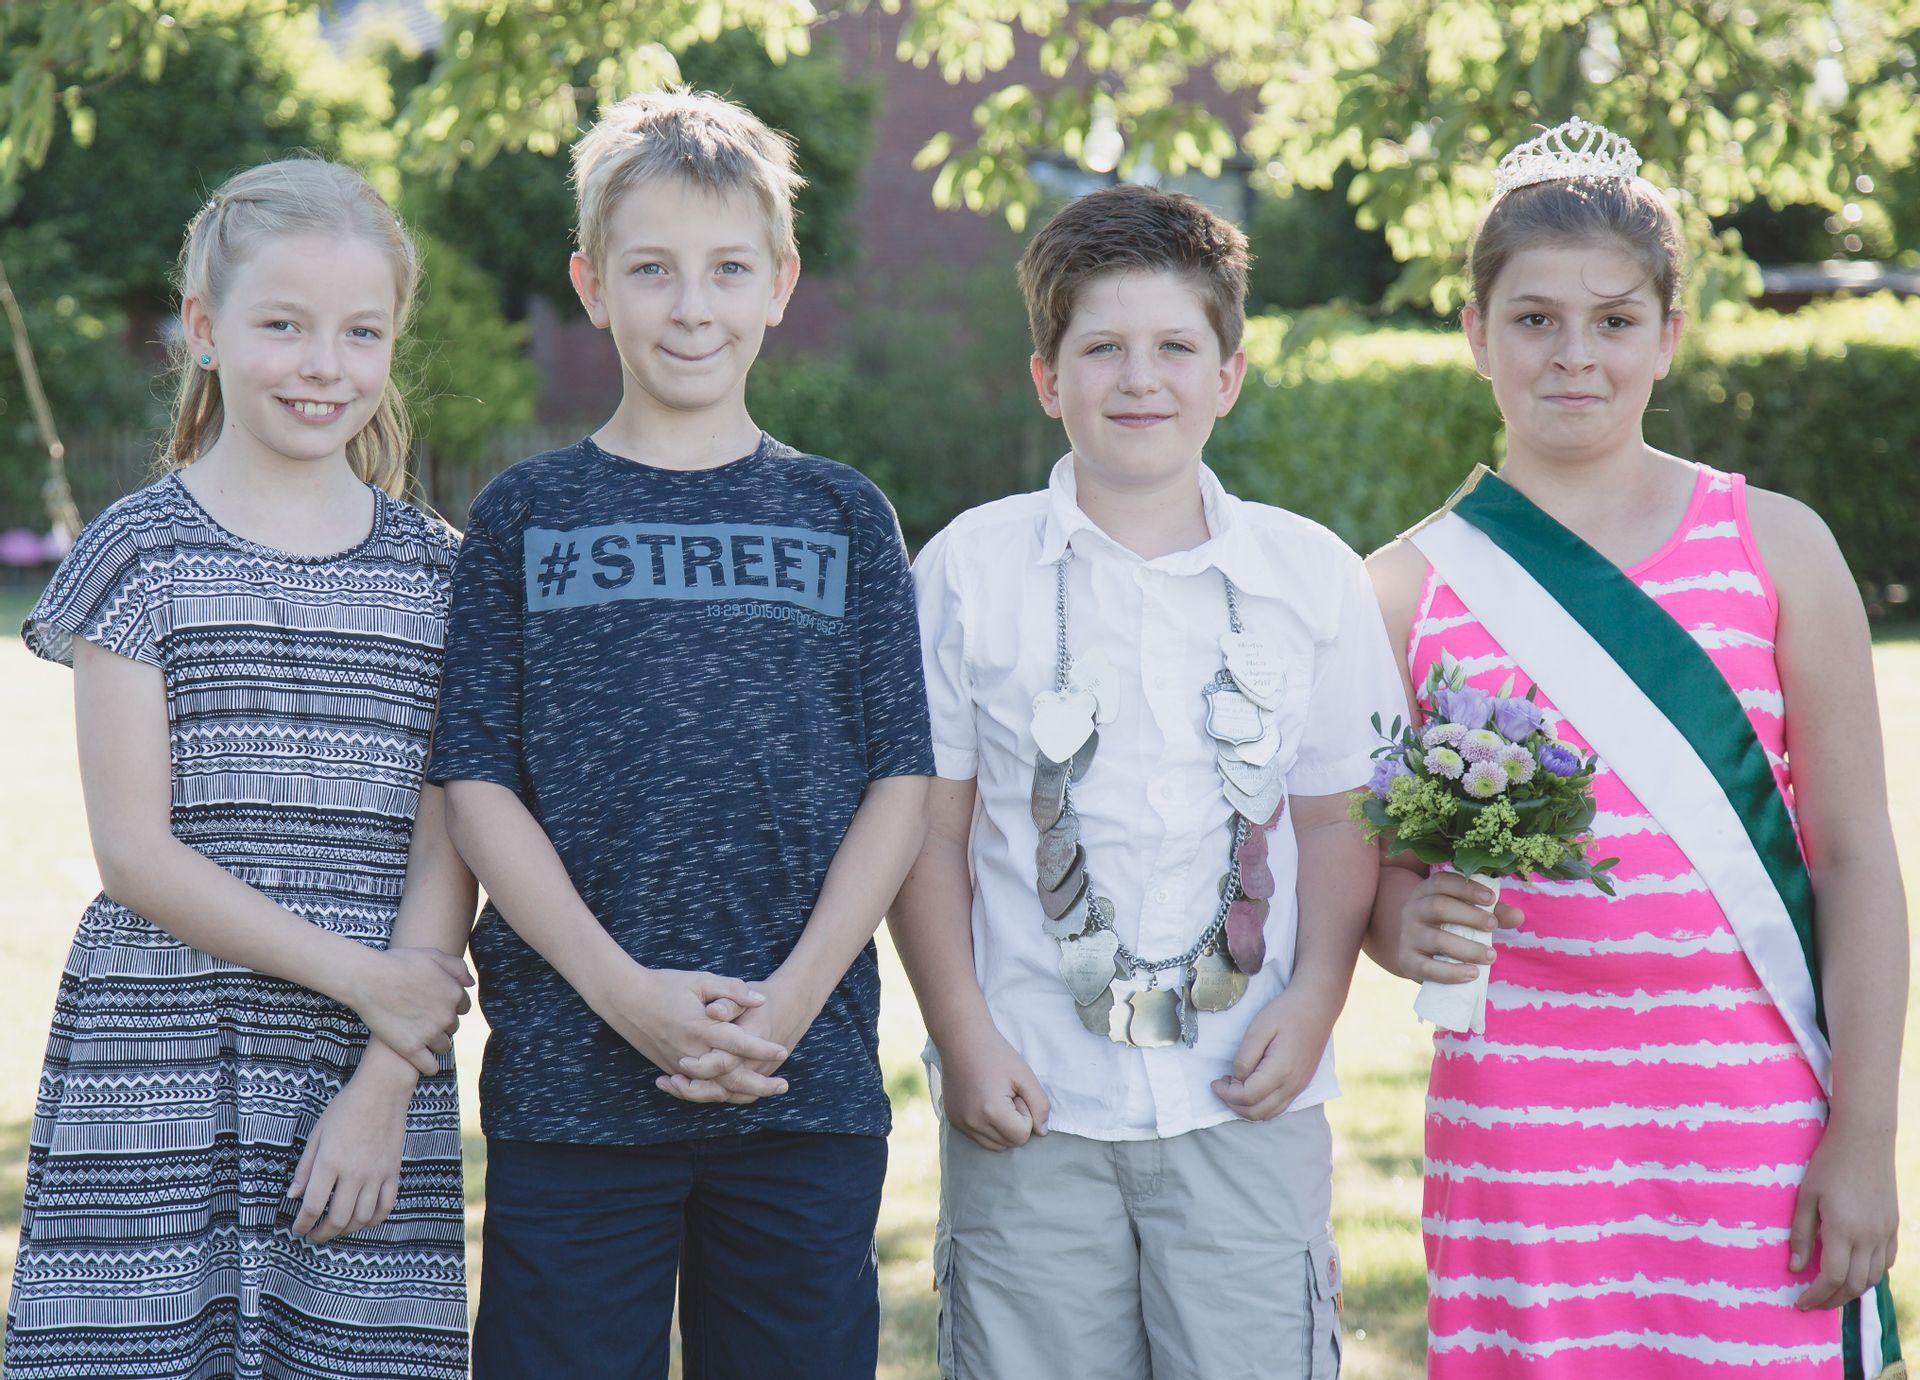 Unsere Kinderkönige